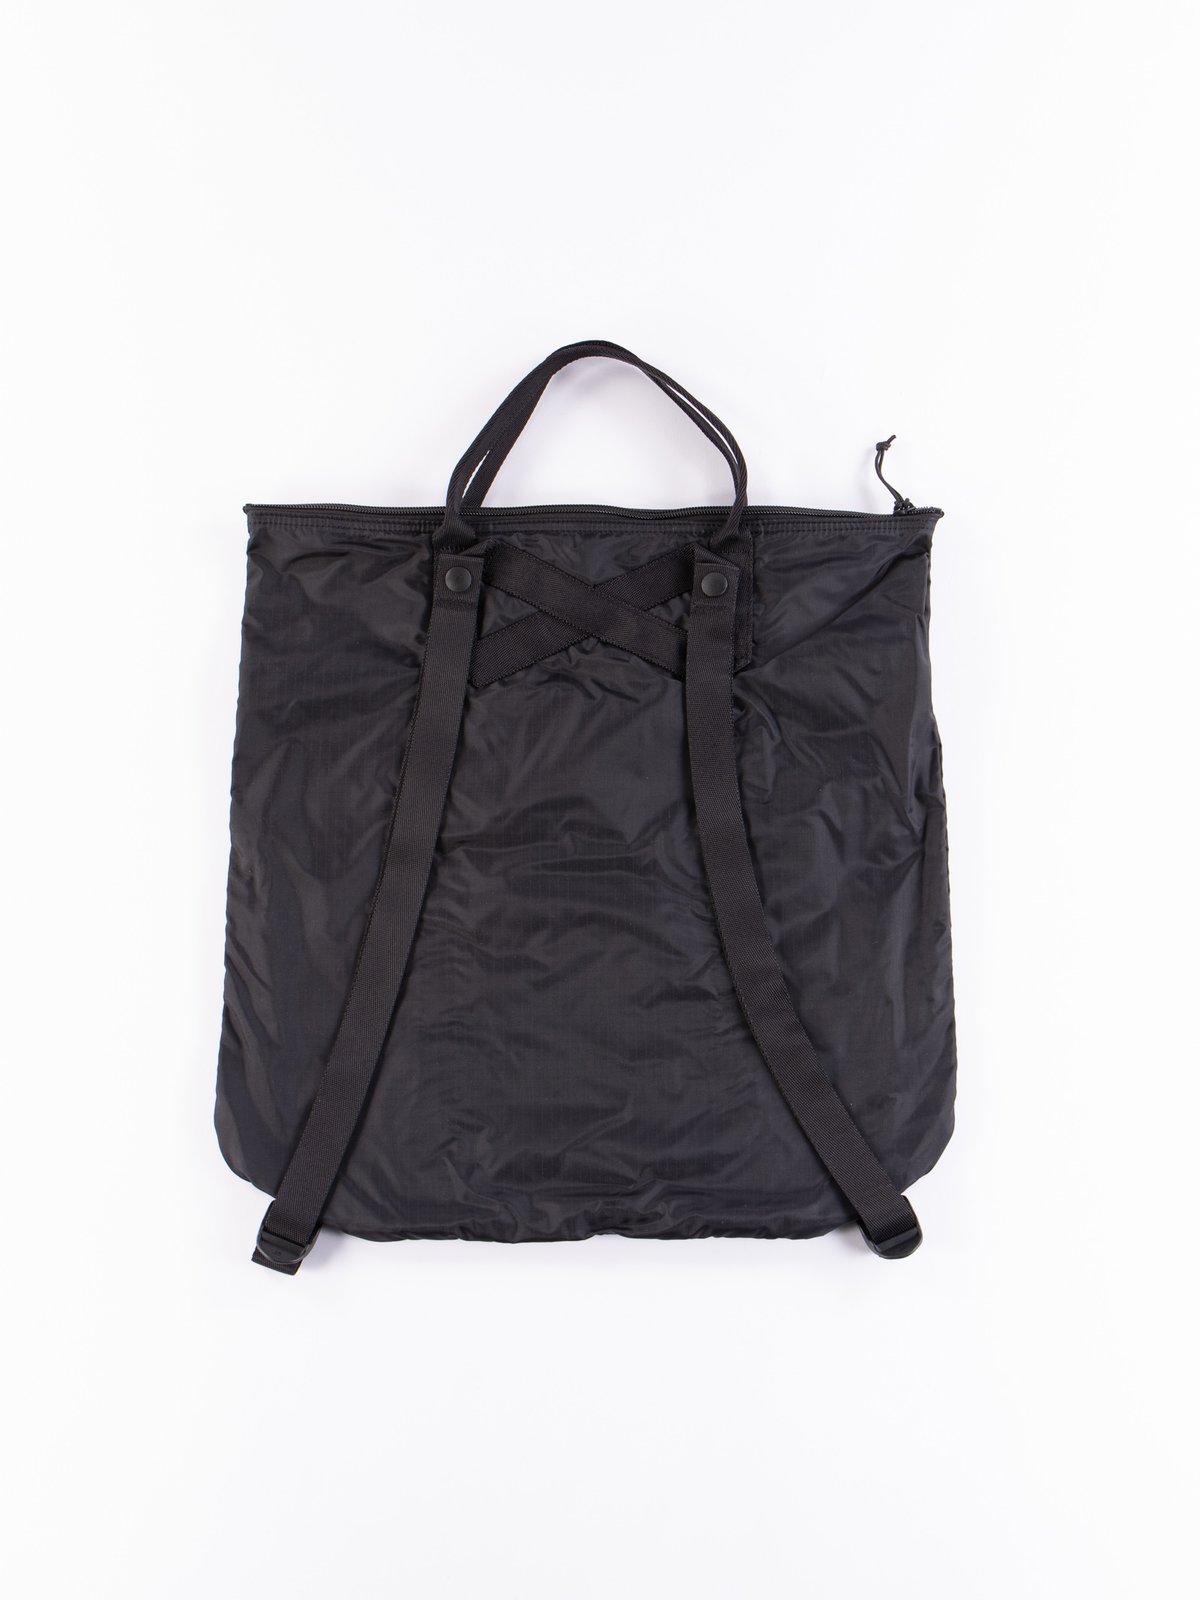 Black Flex 2Way Tote Bag - Image 3